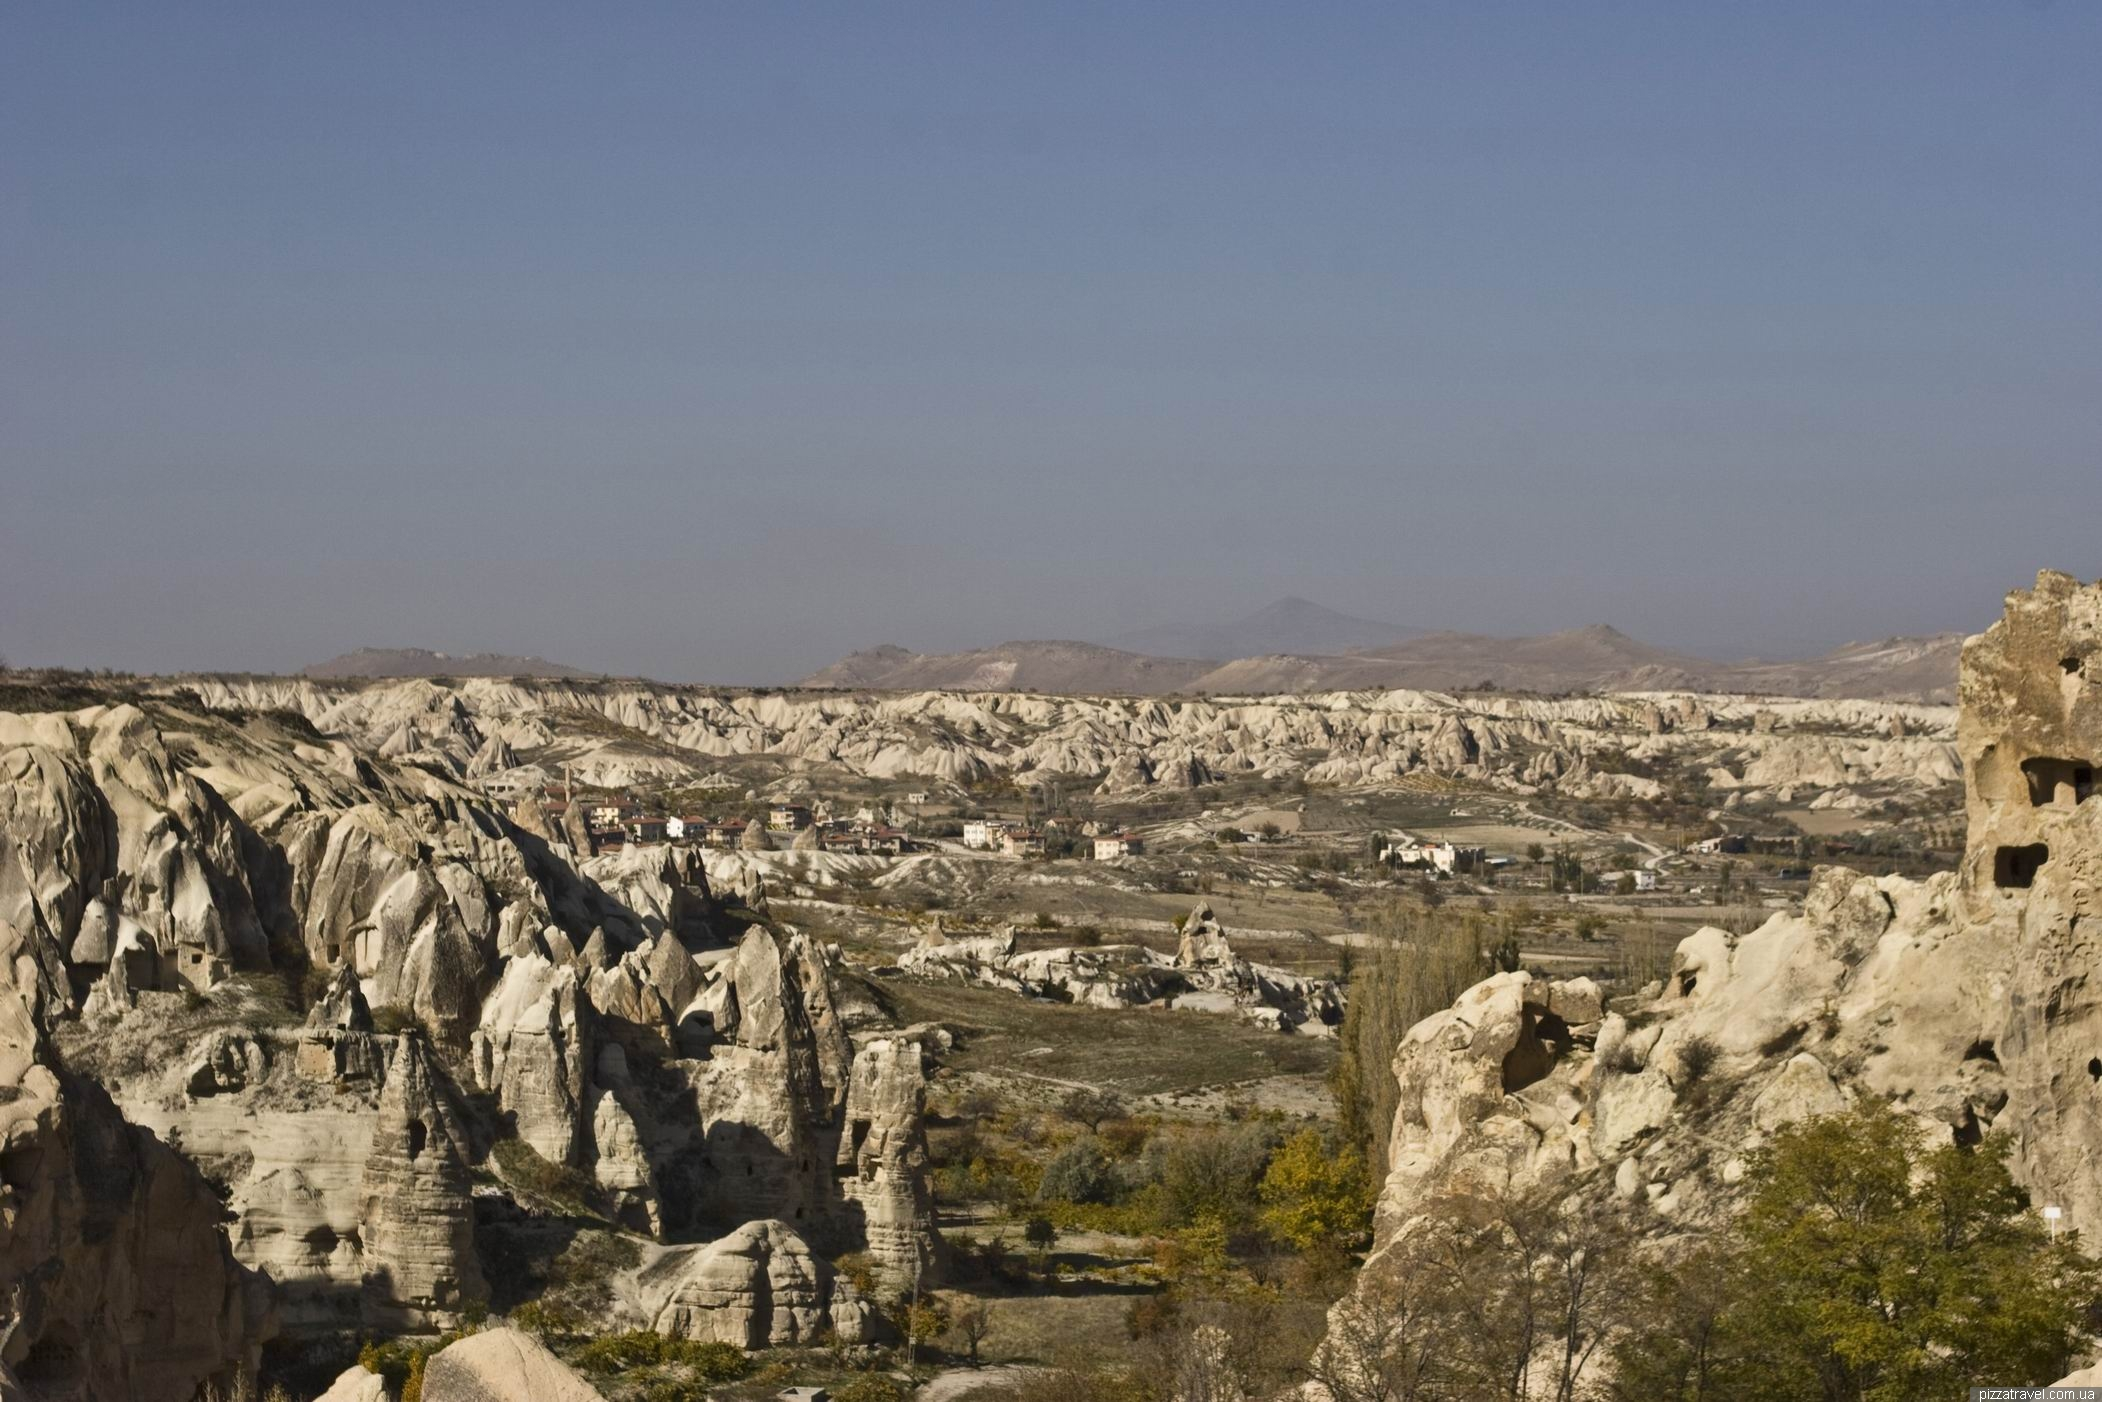 Goreme National Park - Turkey - Blog about interesting places